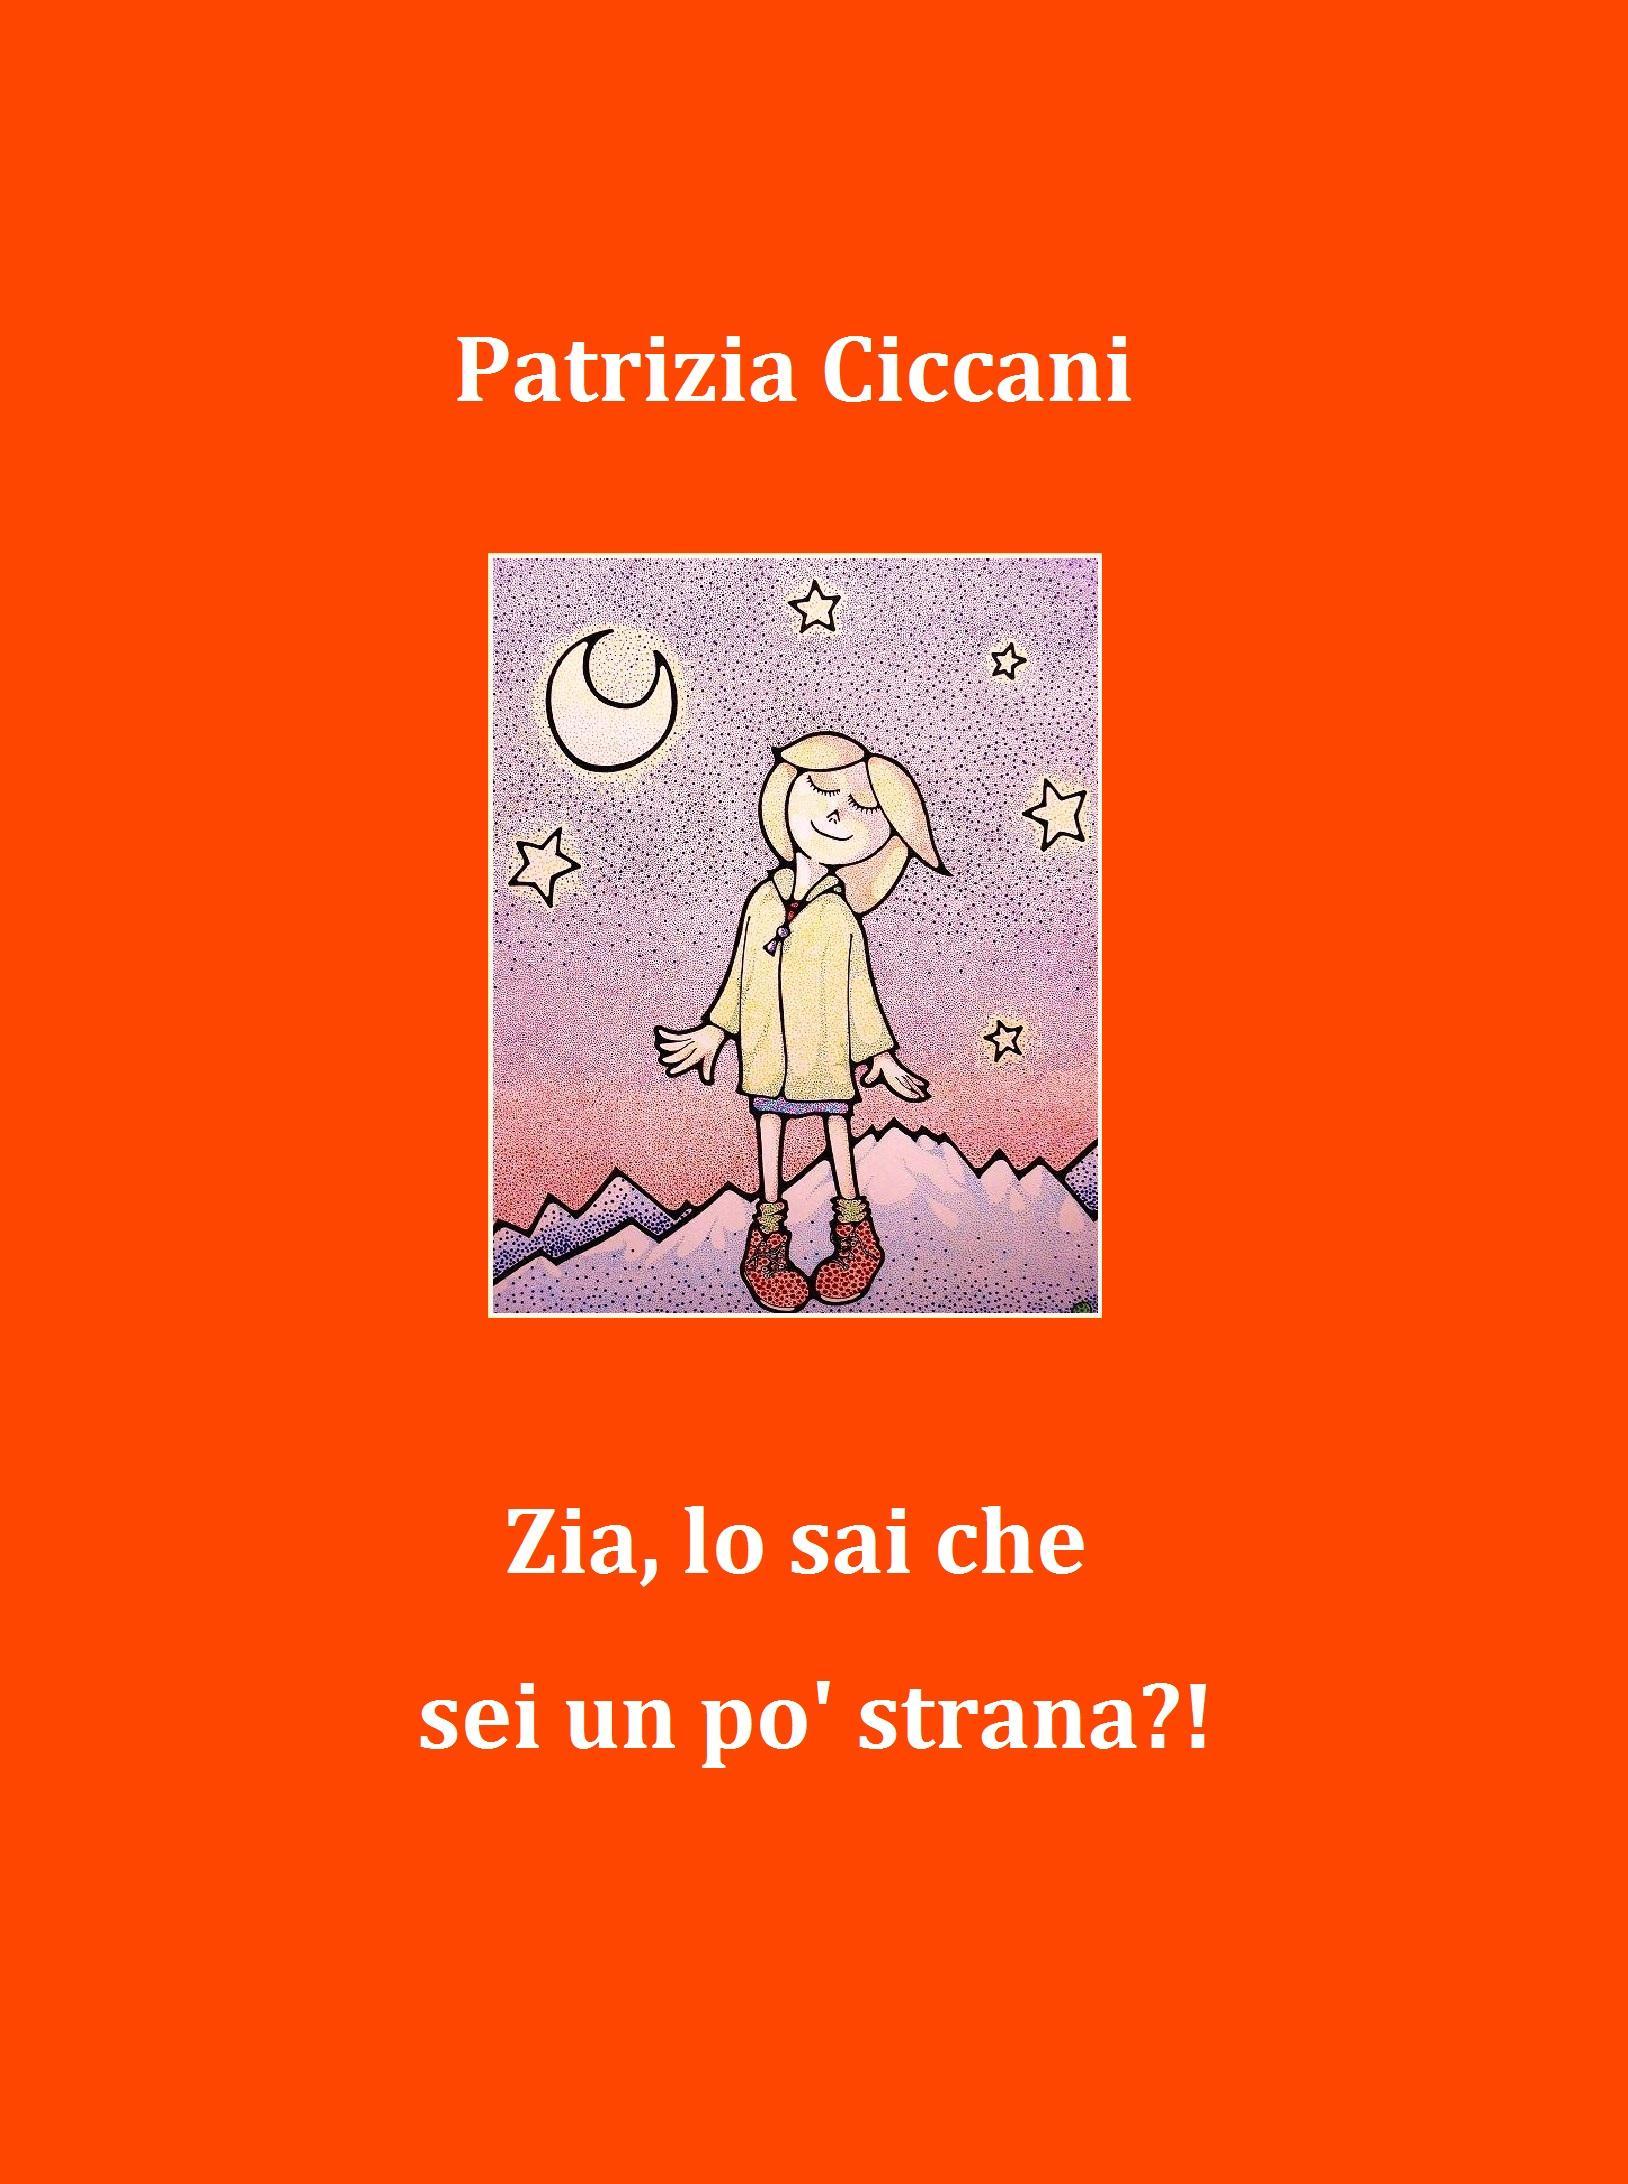 Copertina_libro_Ciccani_